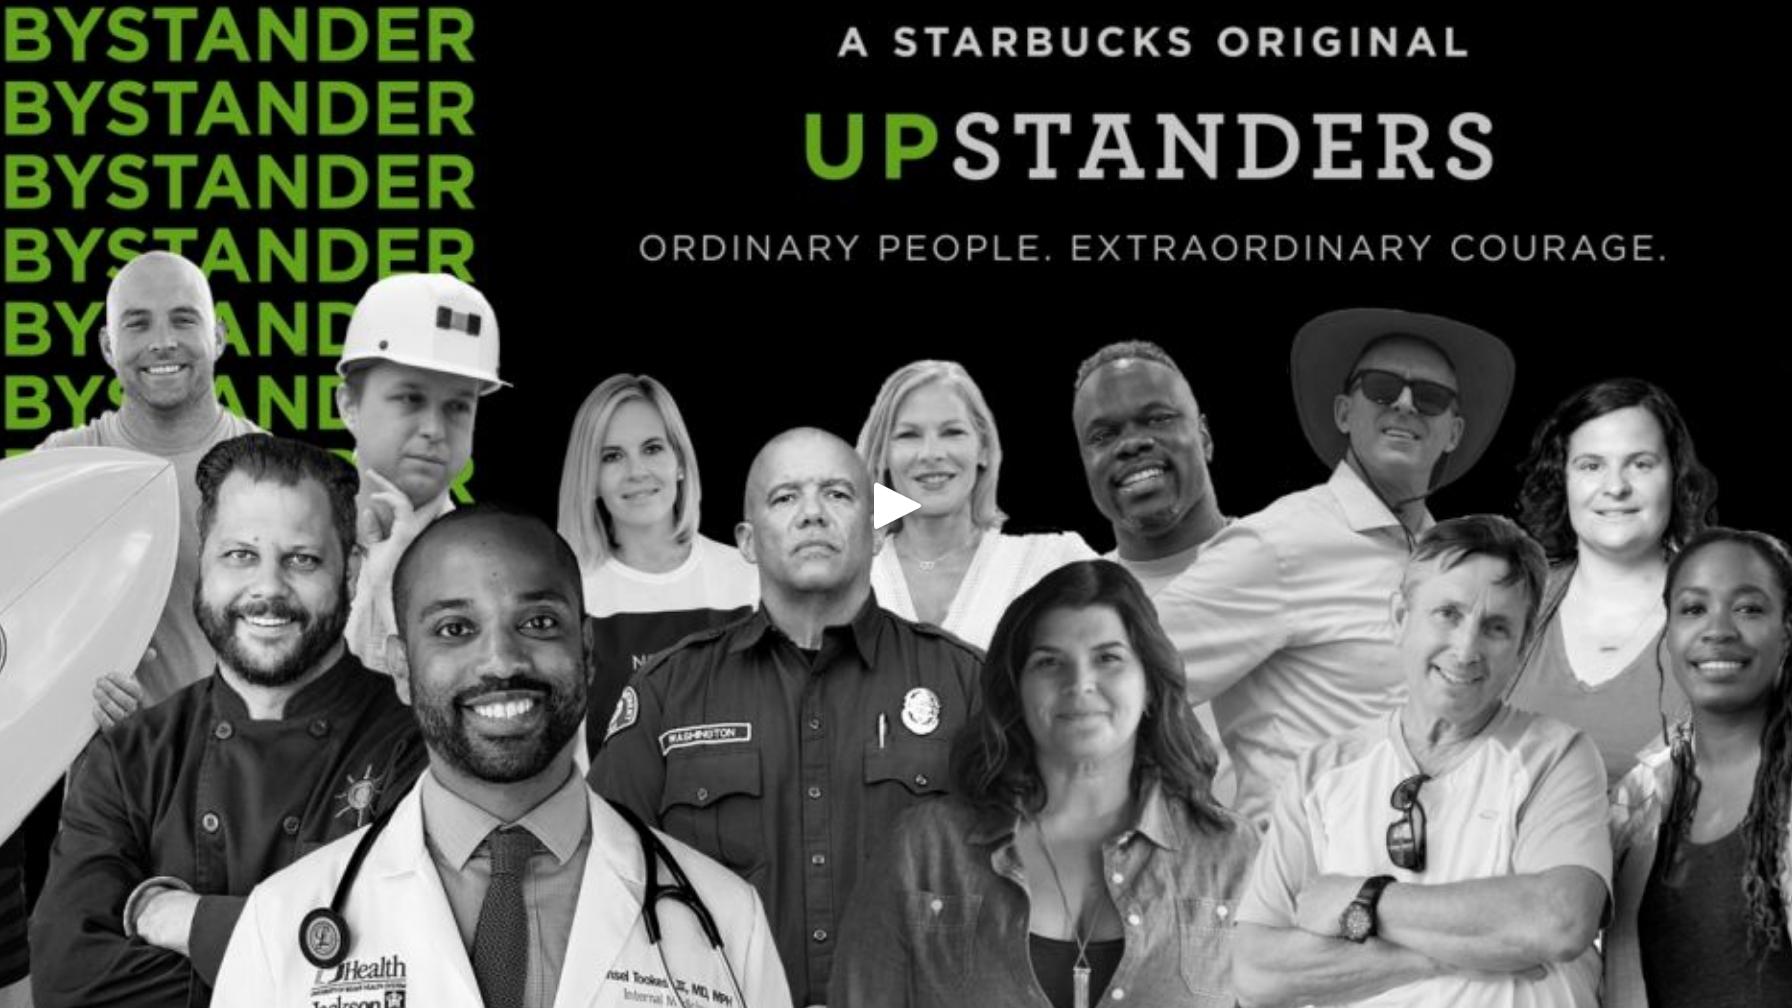 Starbucks: upstanders -